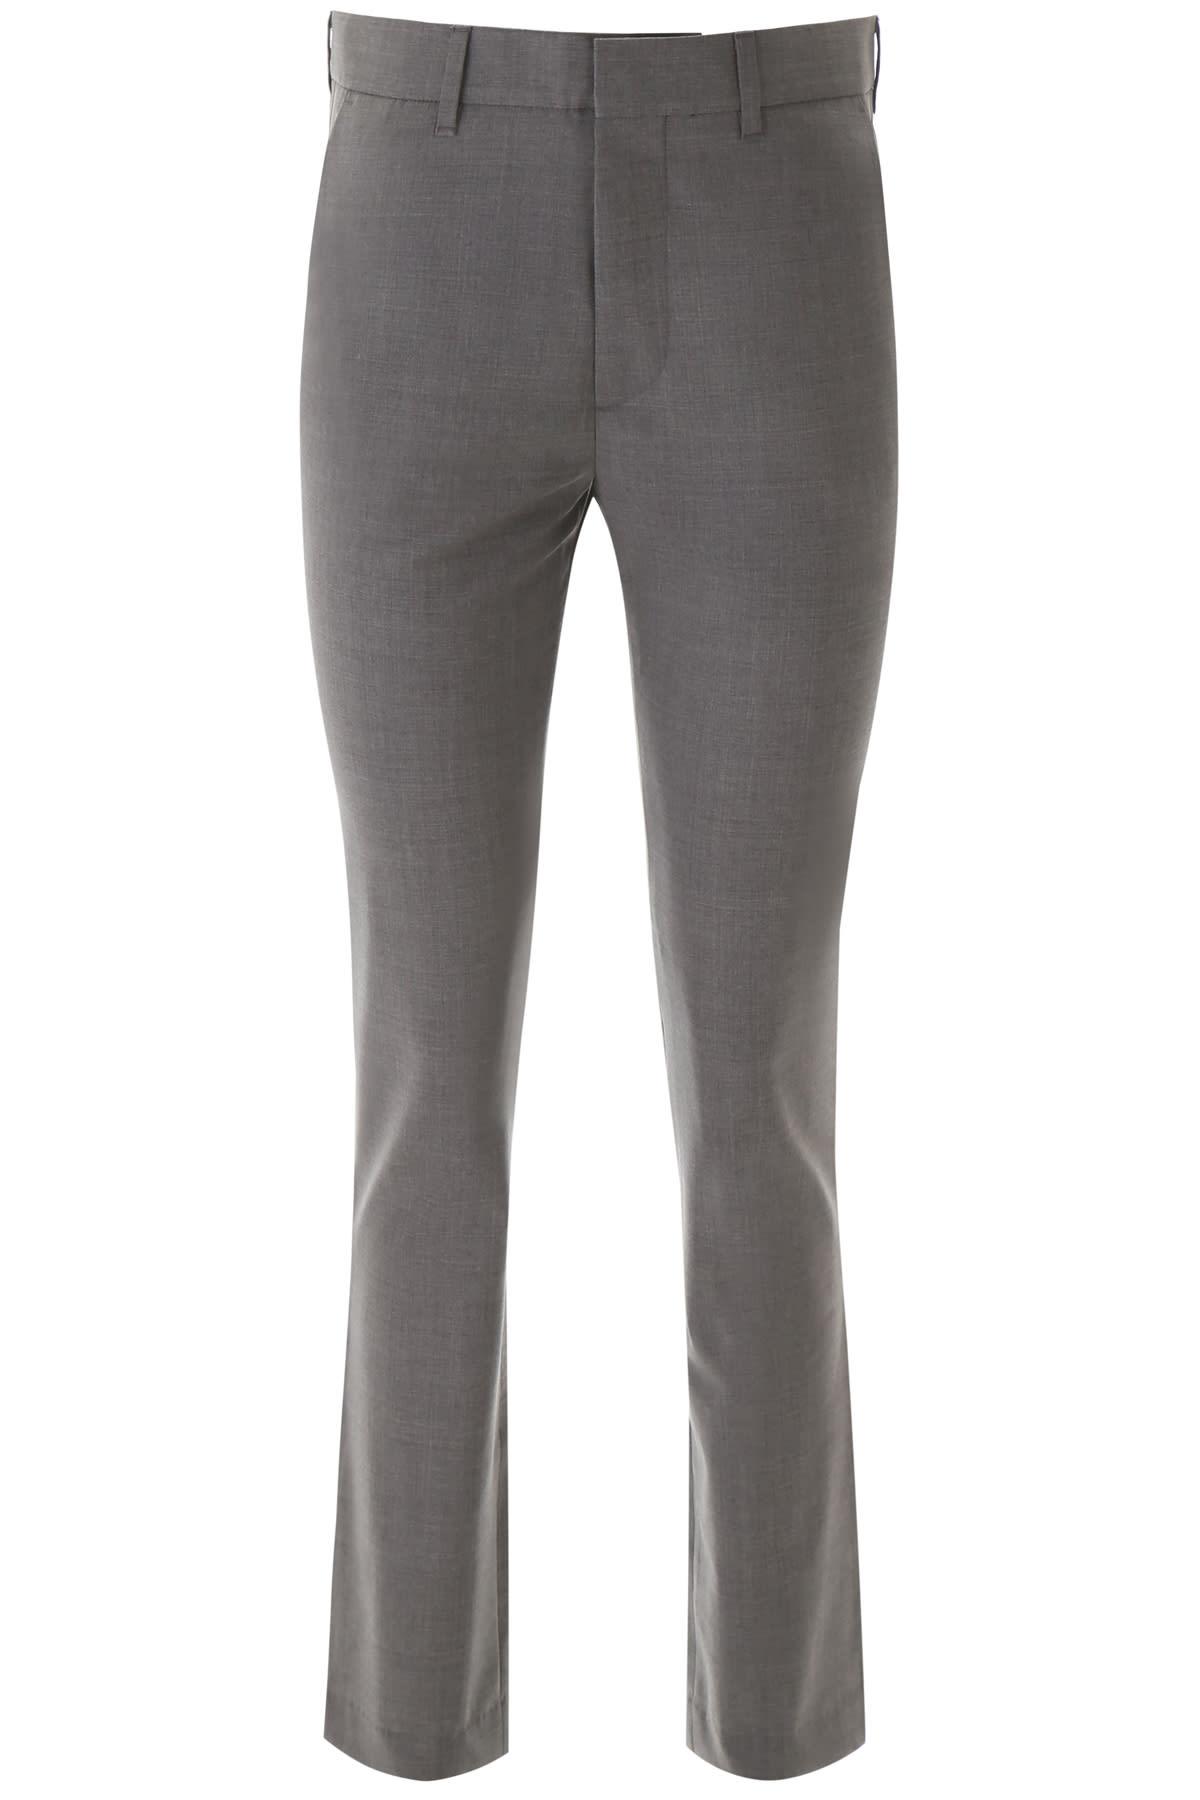 Coperni Formal Trousers